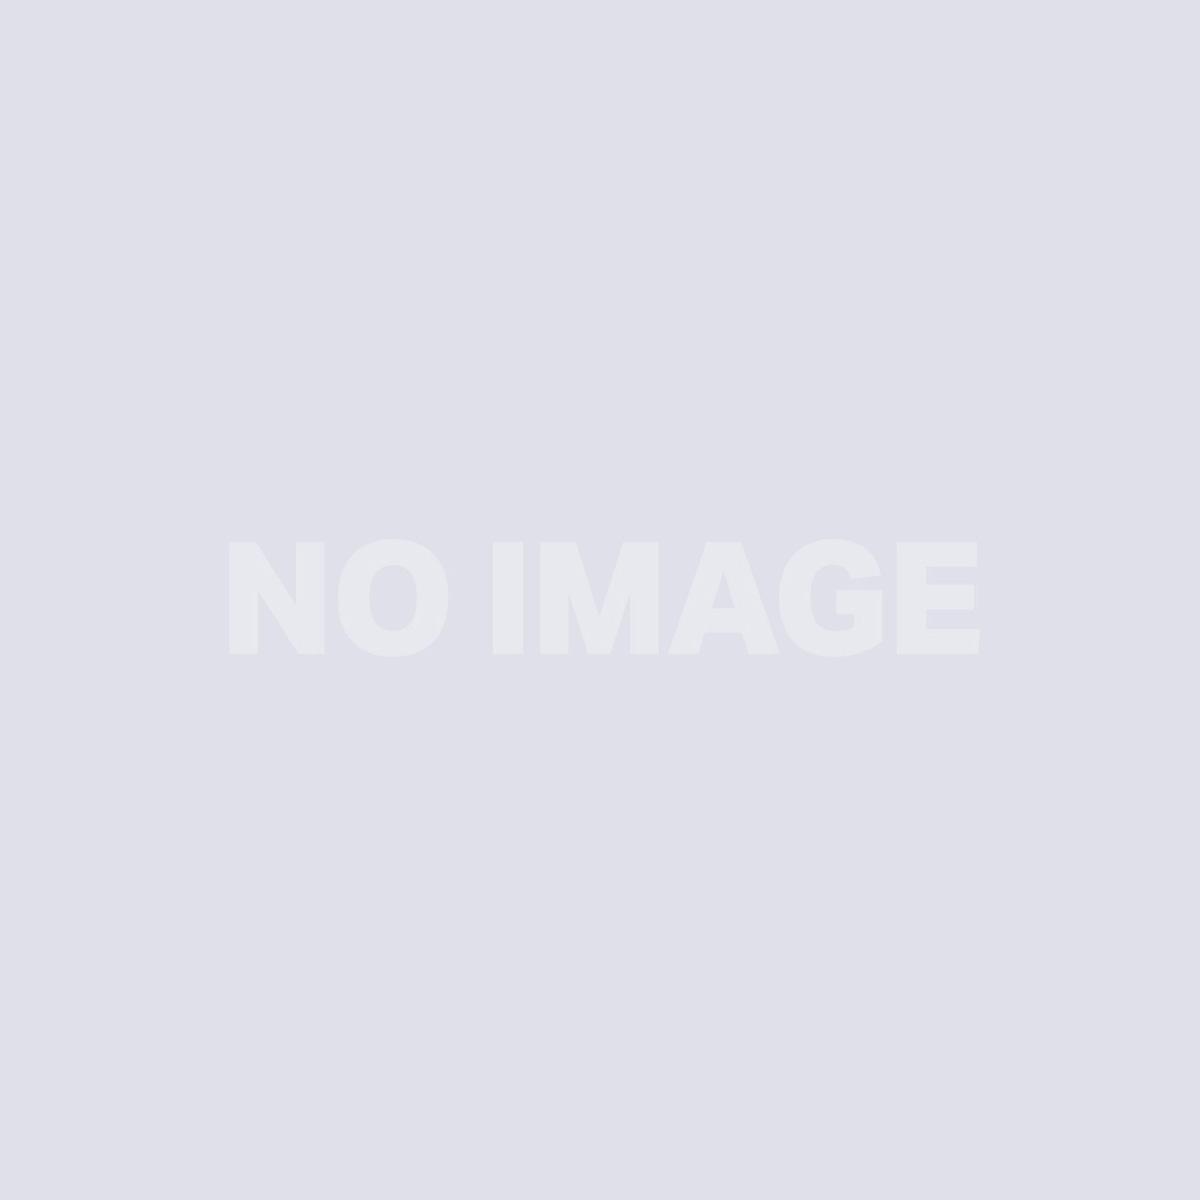 100/25 Grey Rubber Single Bolt Swivel Castor